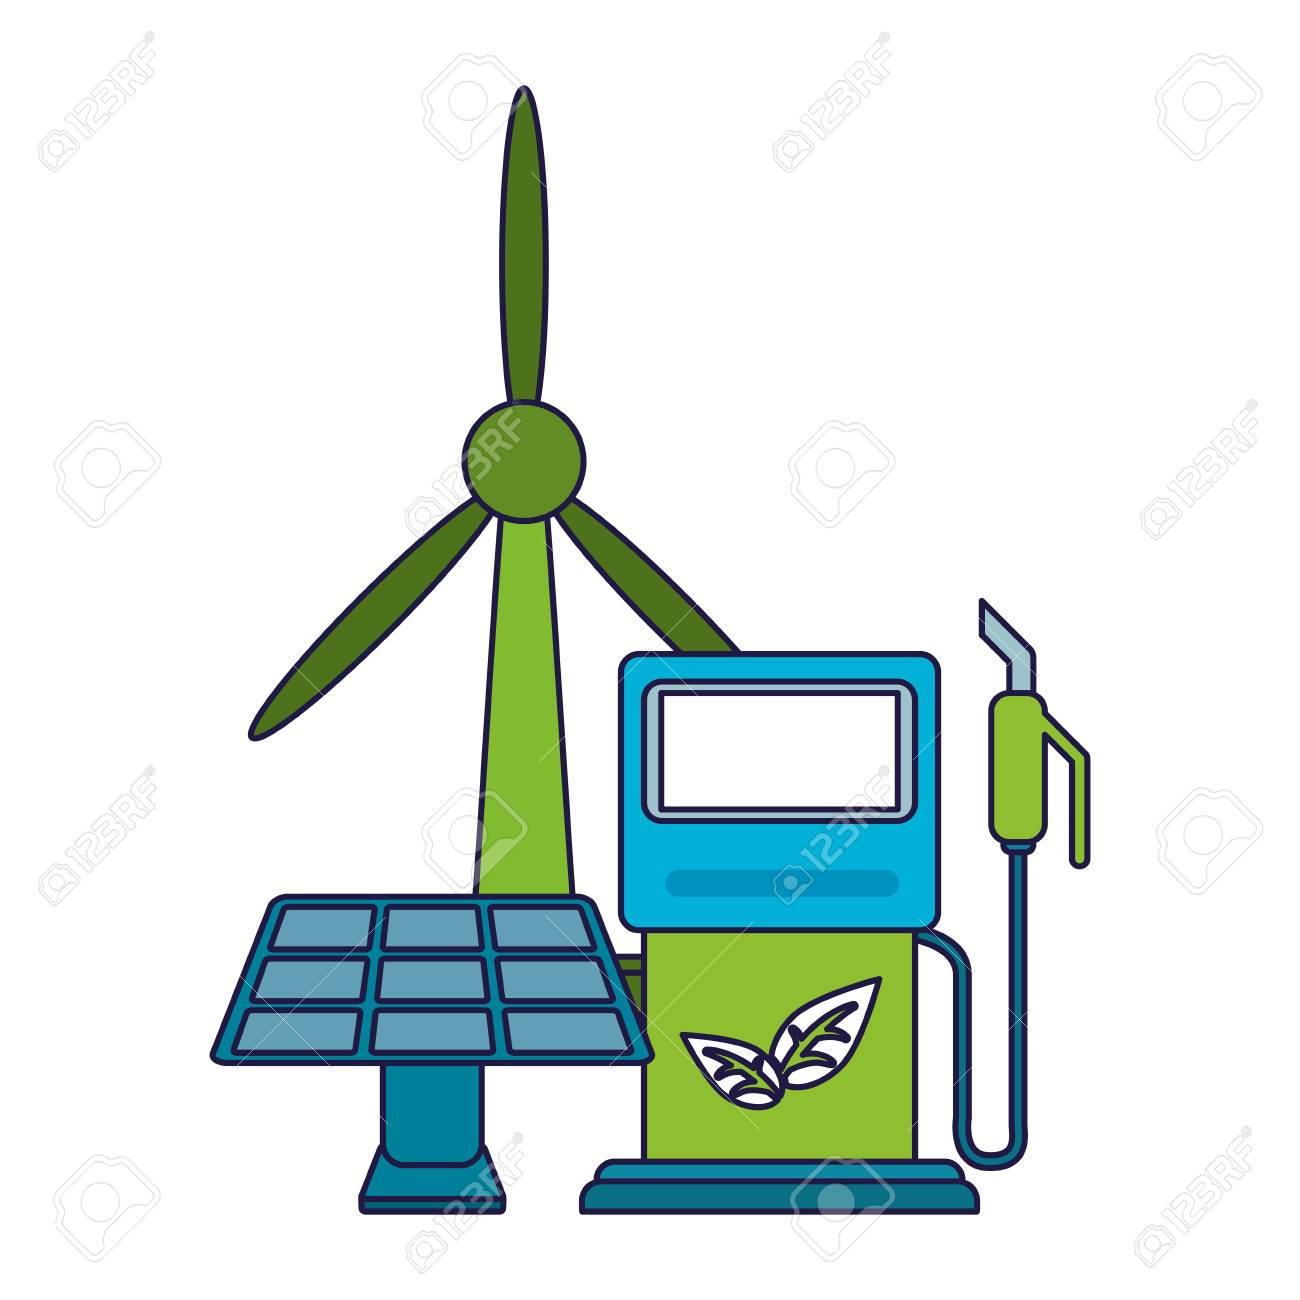 Ecology green energy wind turbine solar panel and fuel dispenser